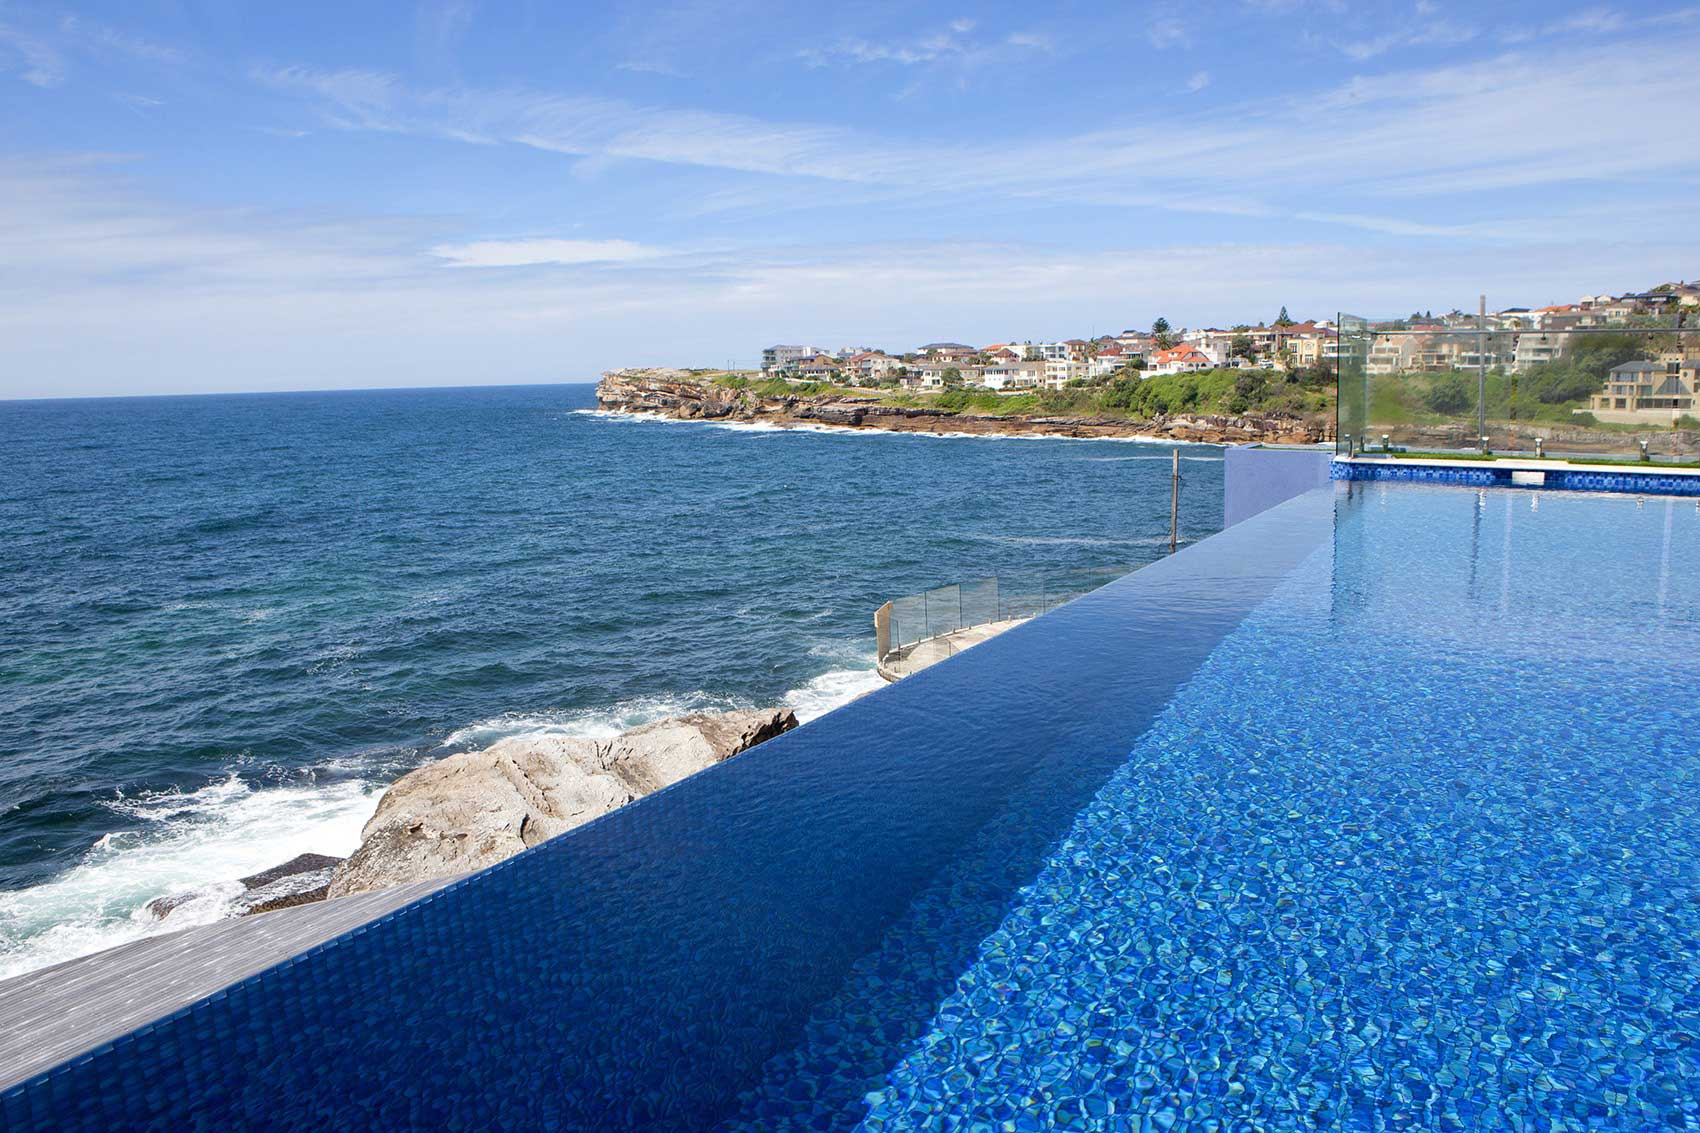 Relaxing Infinity Pool Design No Edges No Boundaries (View 8 of 10)